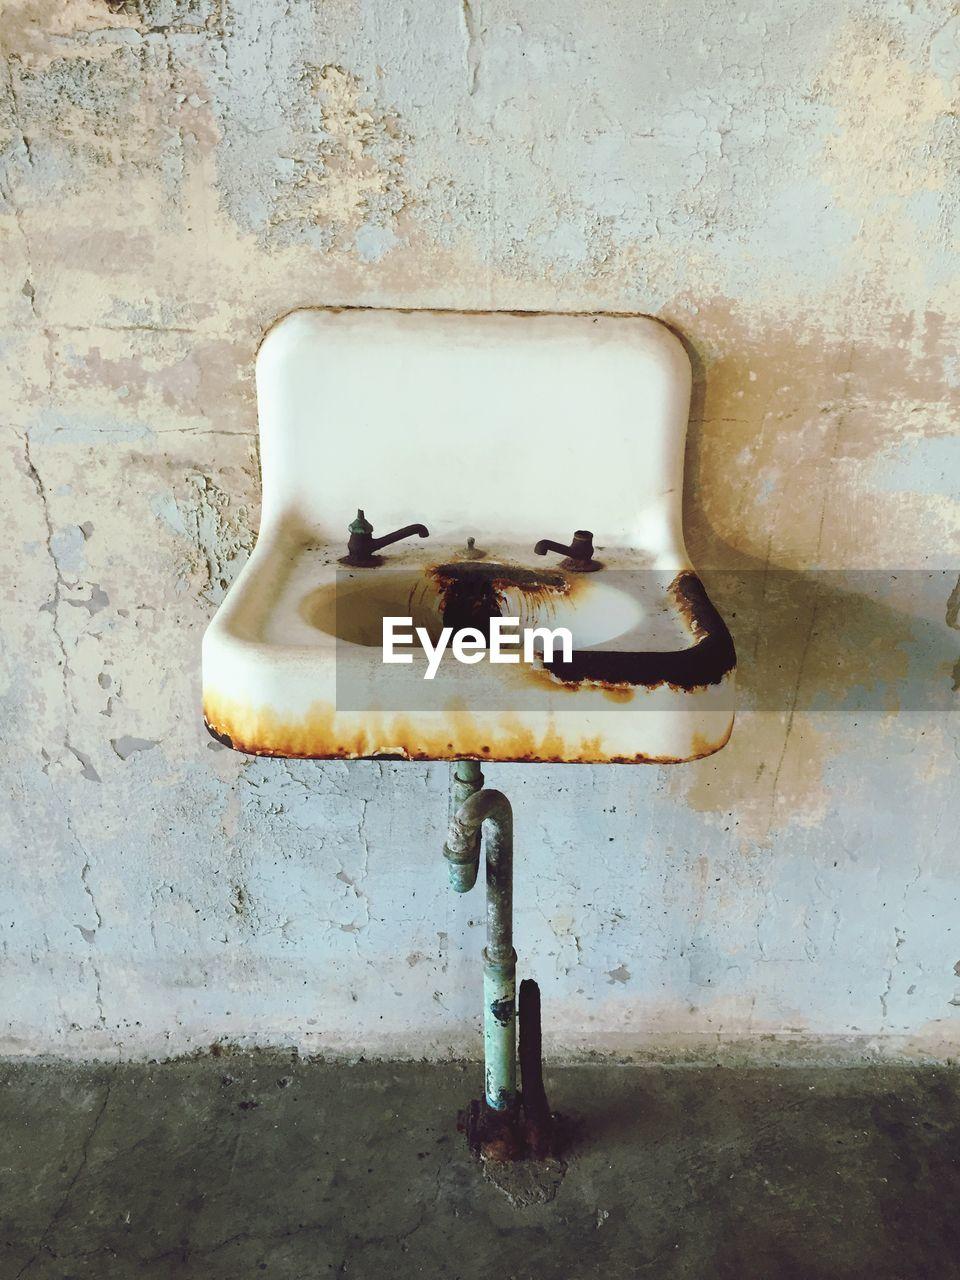 Abandoned sink on wall